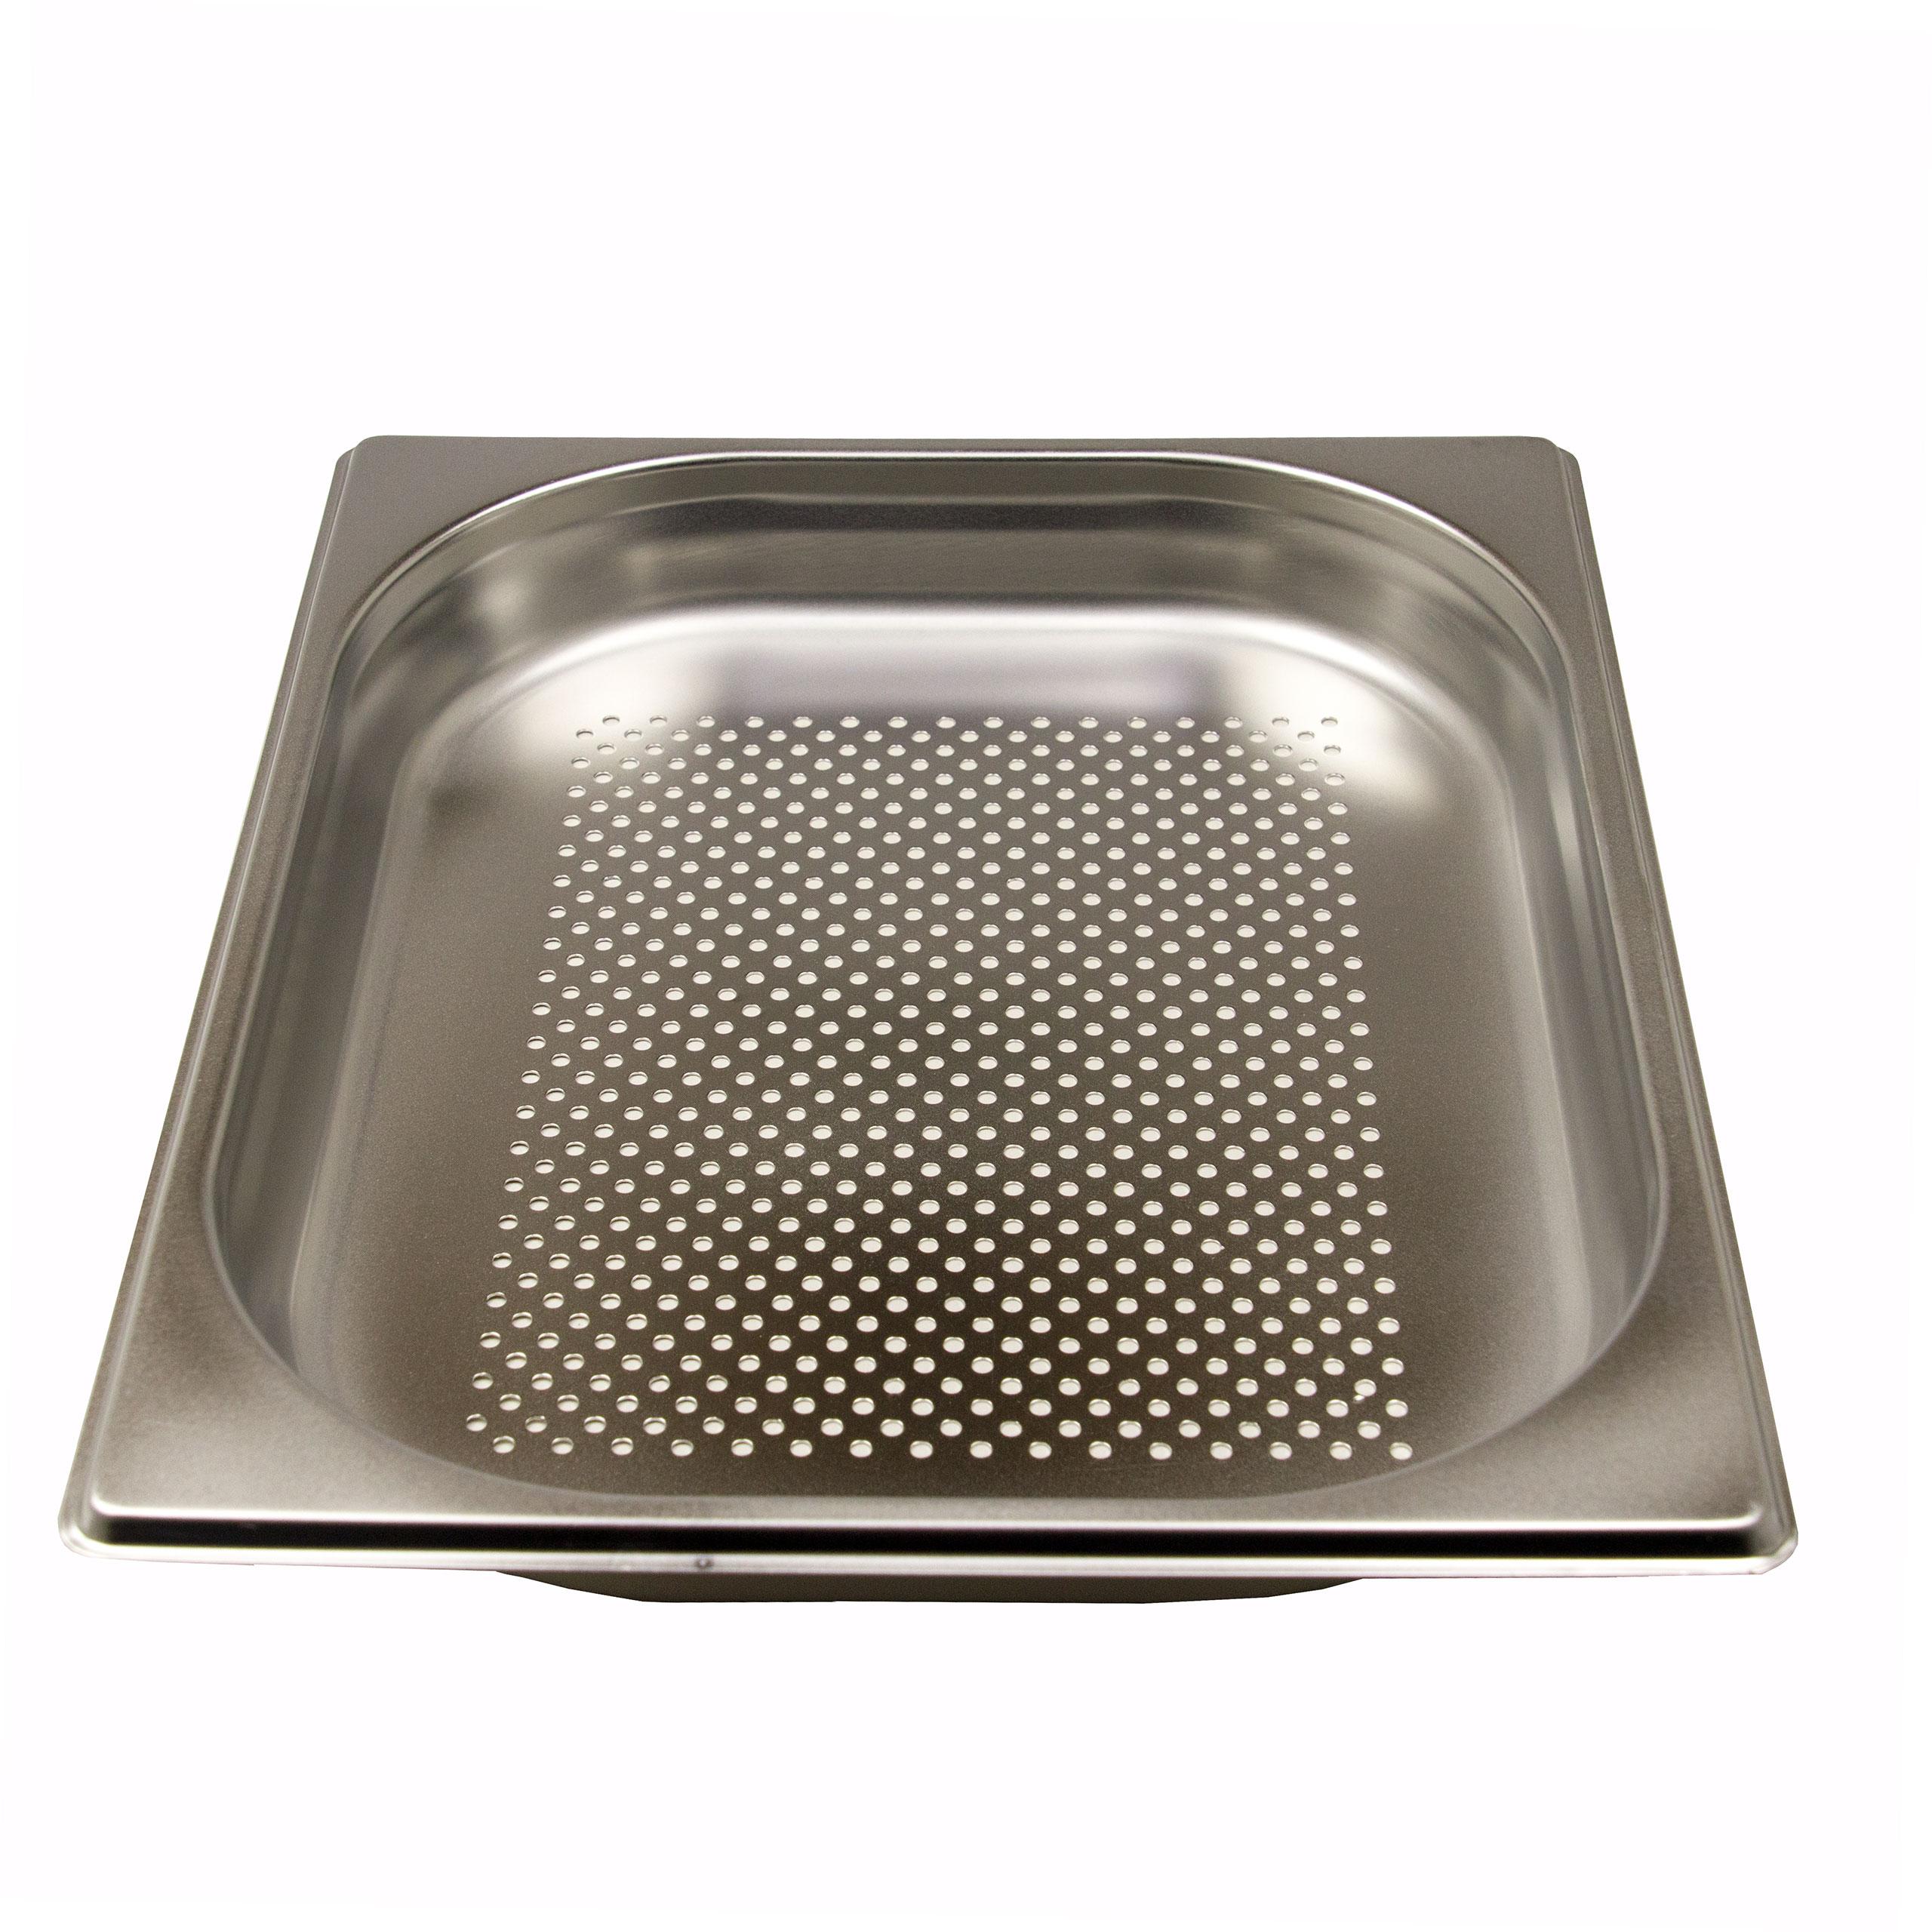 GN 1/2 Gastronormbehälter GN-Behälter Edelstahl 2,5 Liter Tiefe 40mm gelocht